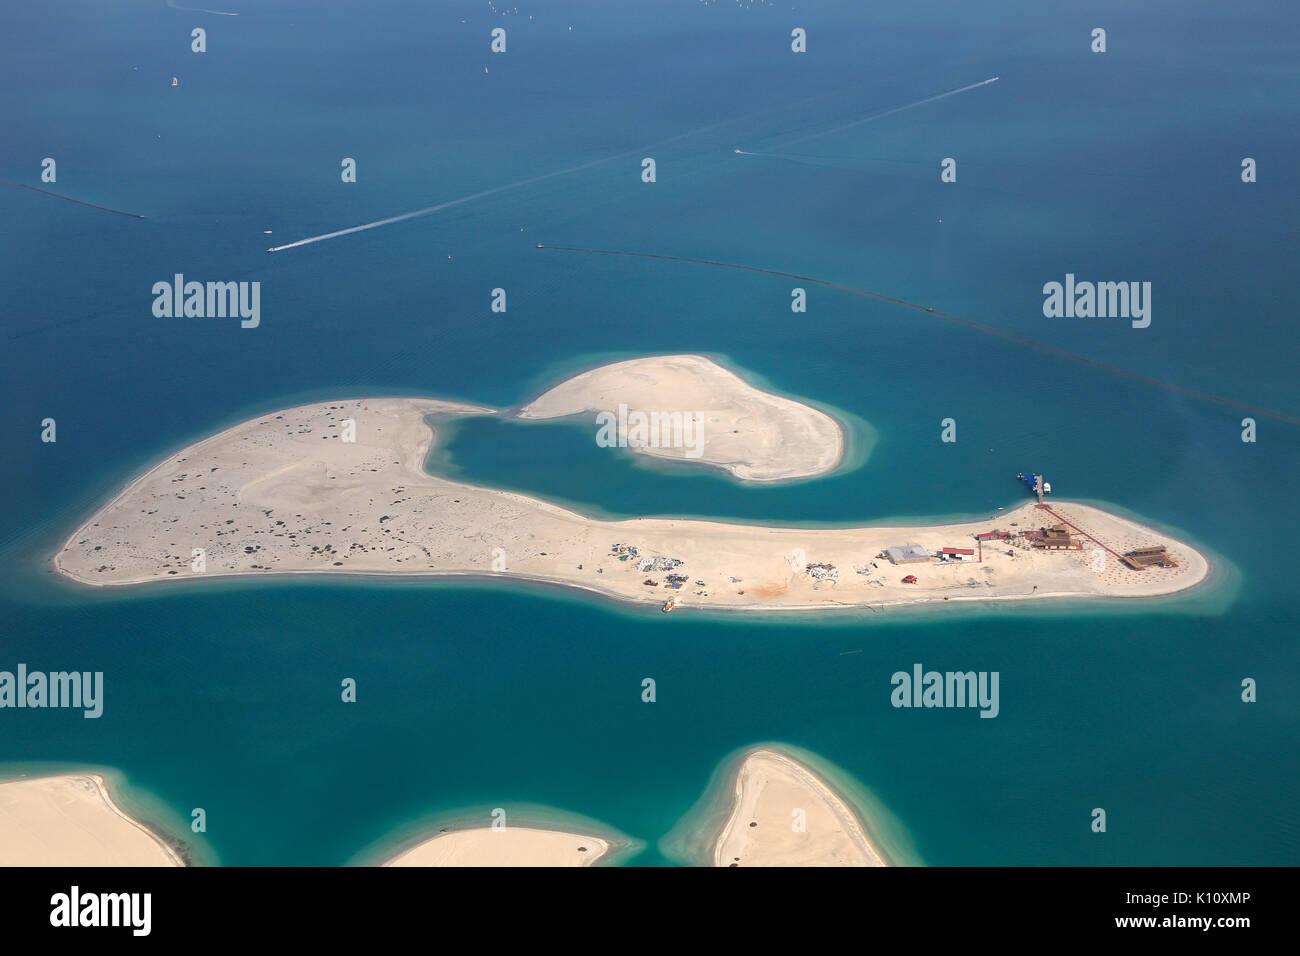 Dubai The World Clarence Island aerial view photography UAE Stock Photo